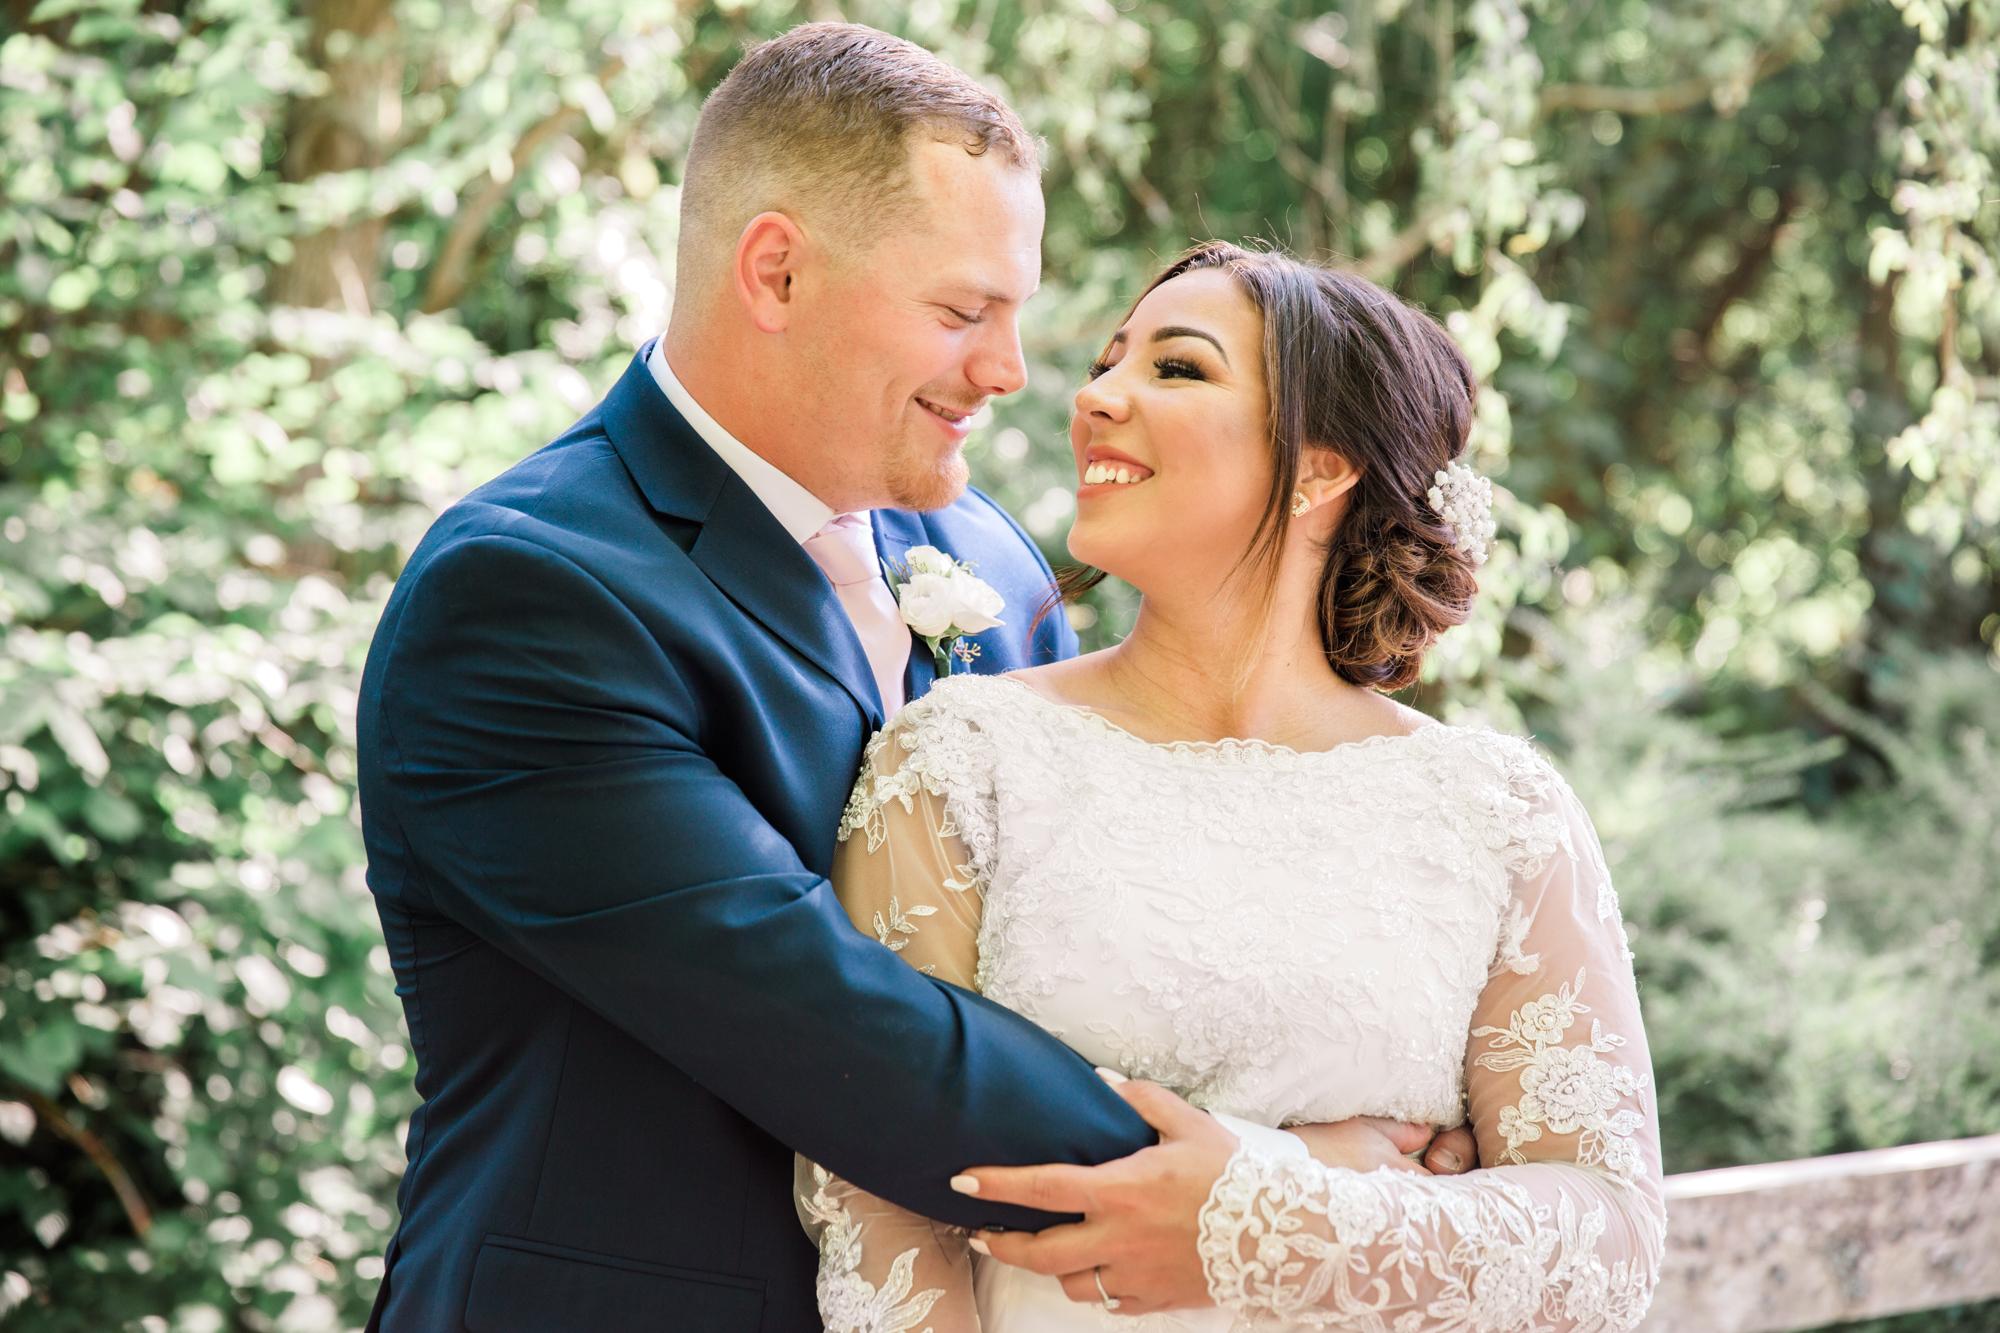 Eden&MePhoto|Wedding|Lexi&Jacob|Issaquah